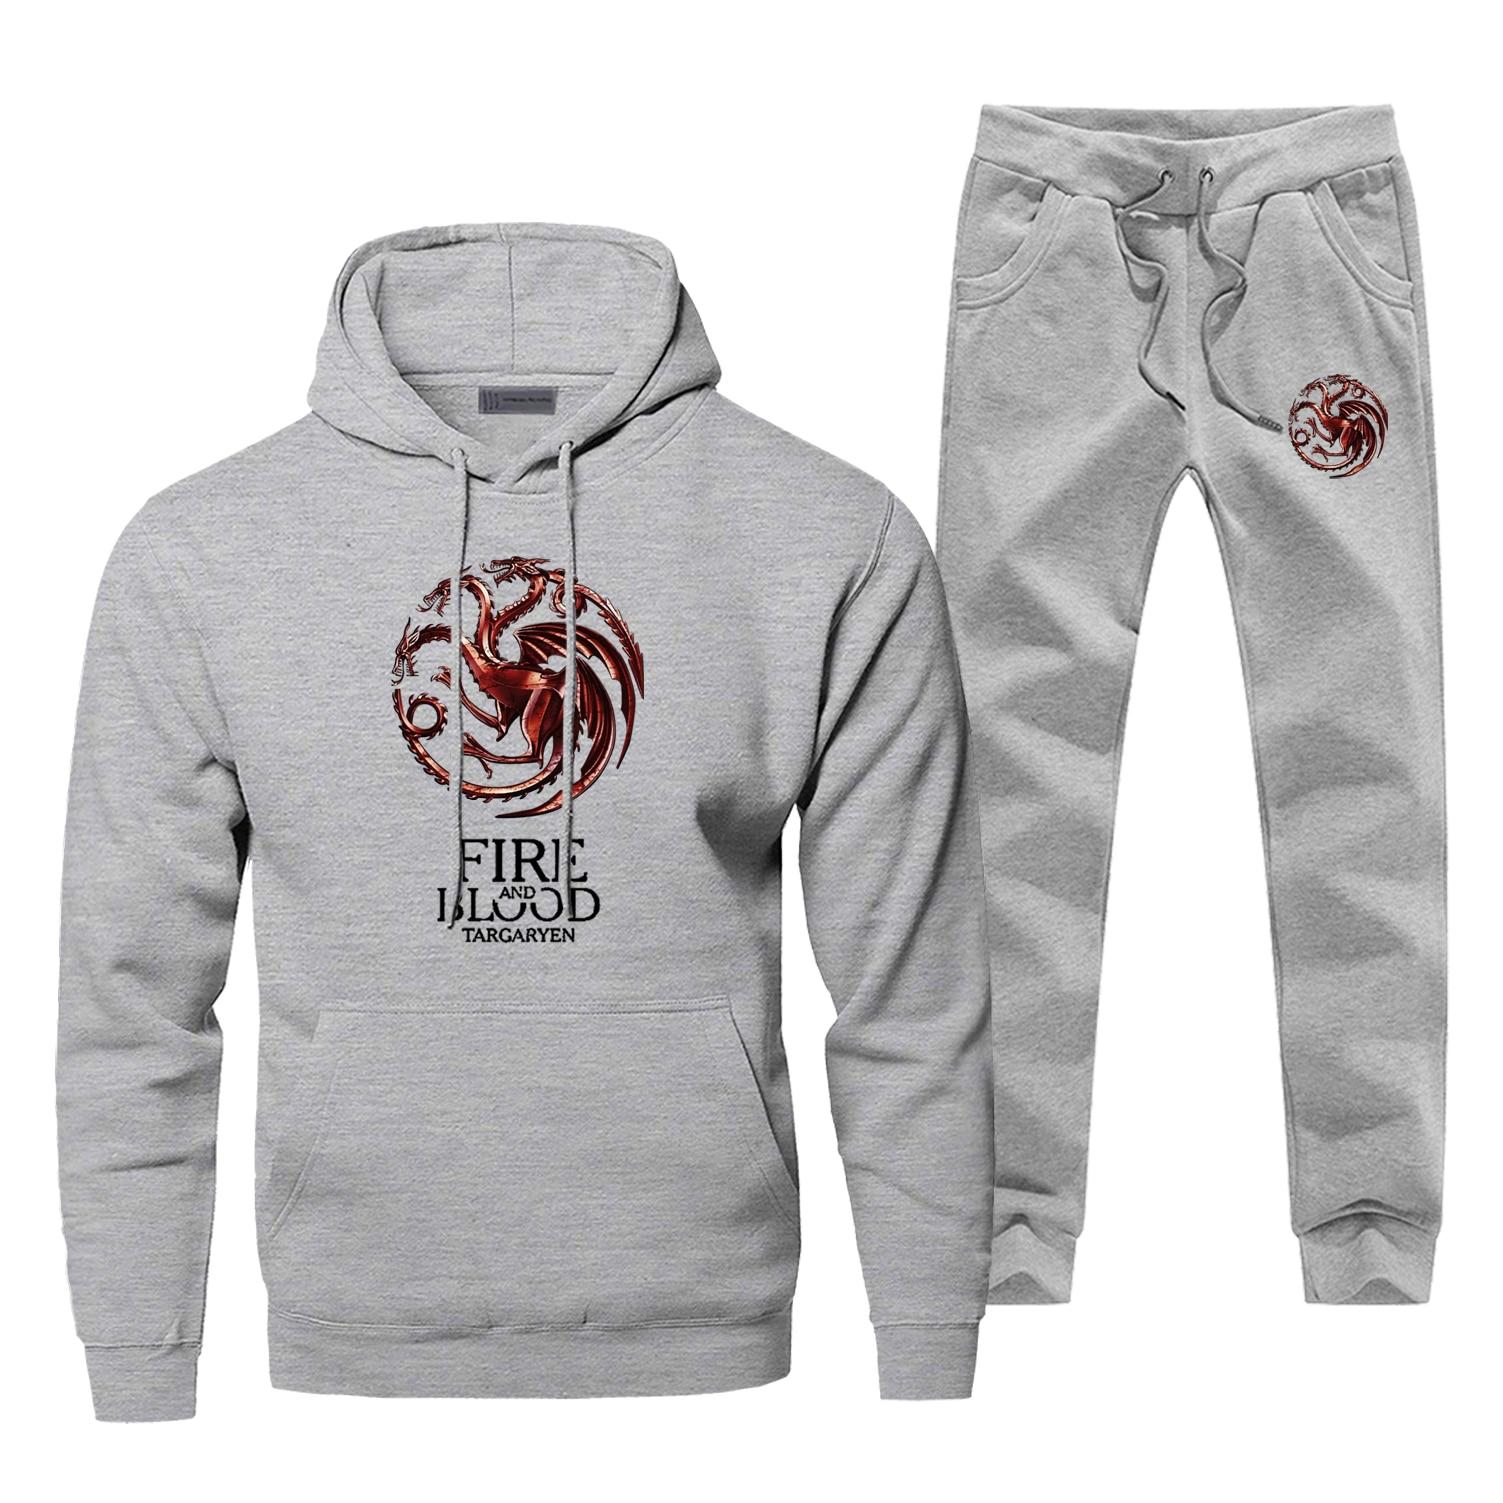 Game Of Thrones Tracksuit Fire And Blood Warm Hoodies +pants Mens 2Pcs Sets House Targaryen Sweatshirt Sportswear Sweatpants